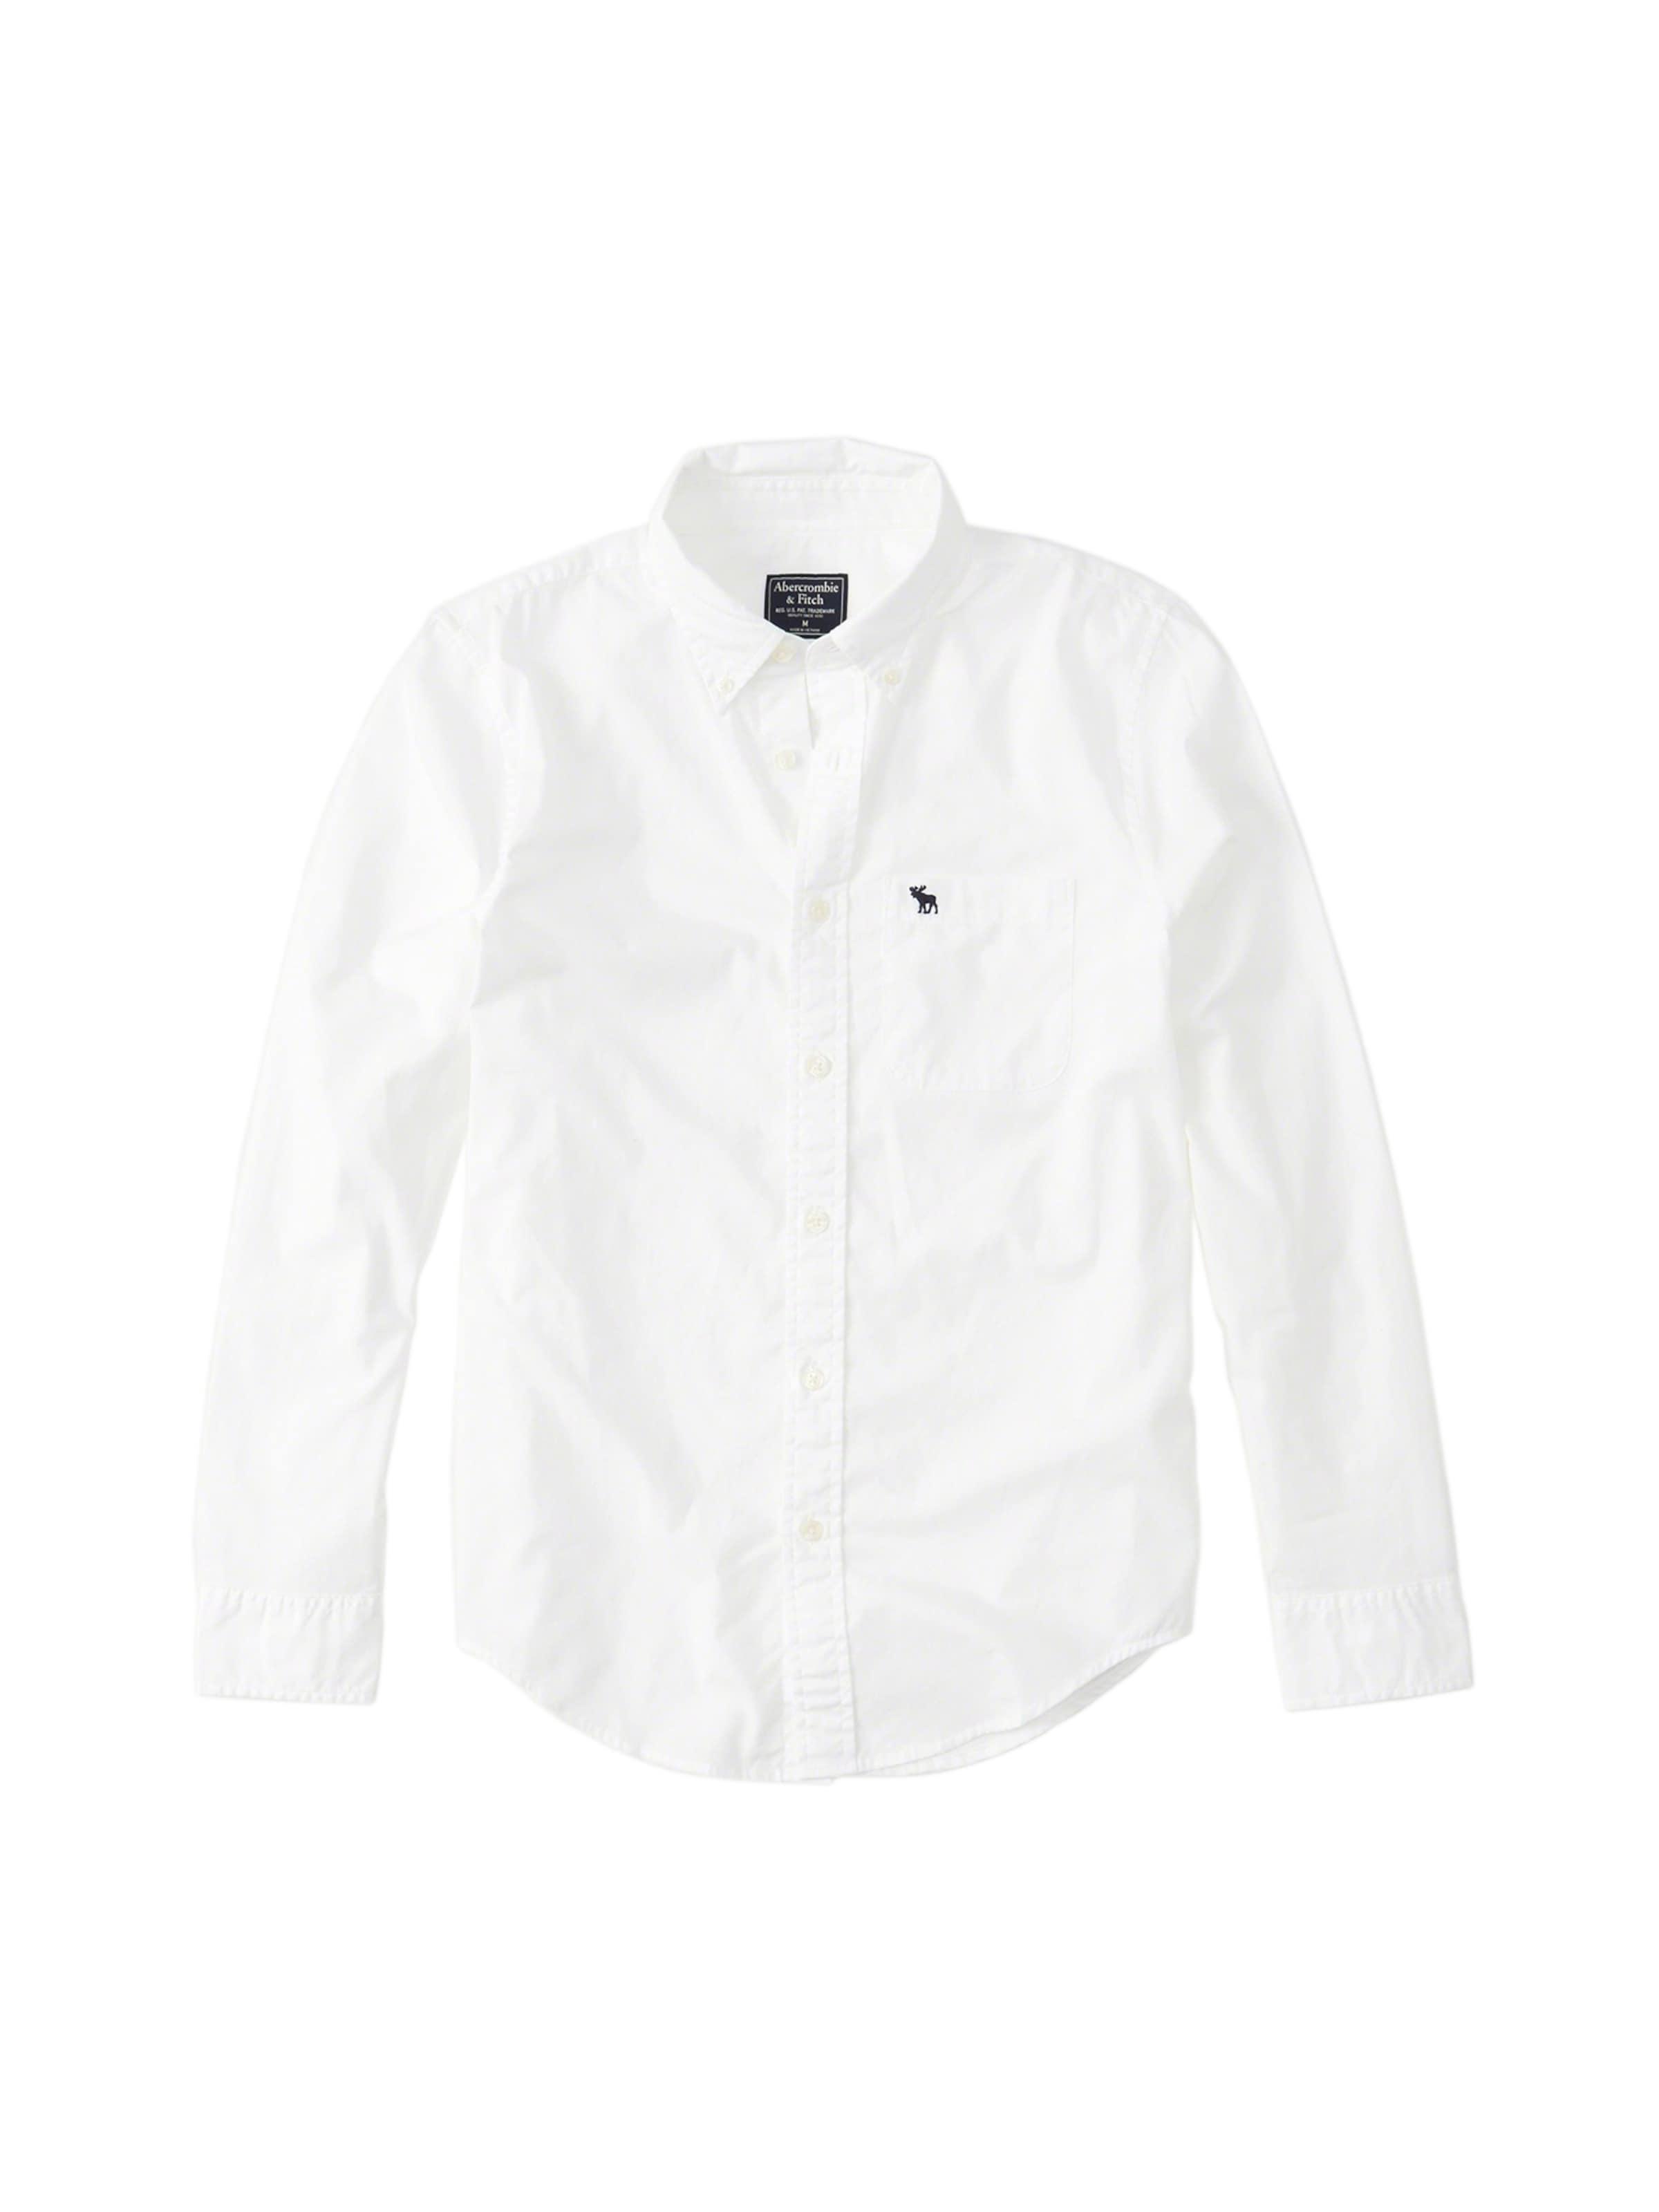 Fitch 3cc' In 'poplin Weiß Abercrombieamp; Hemd Shirt UVGSzMqp